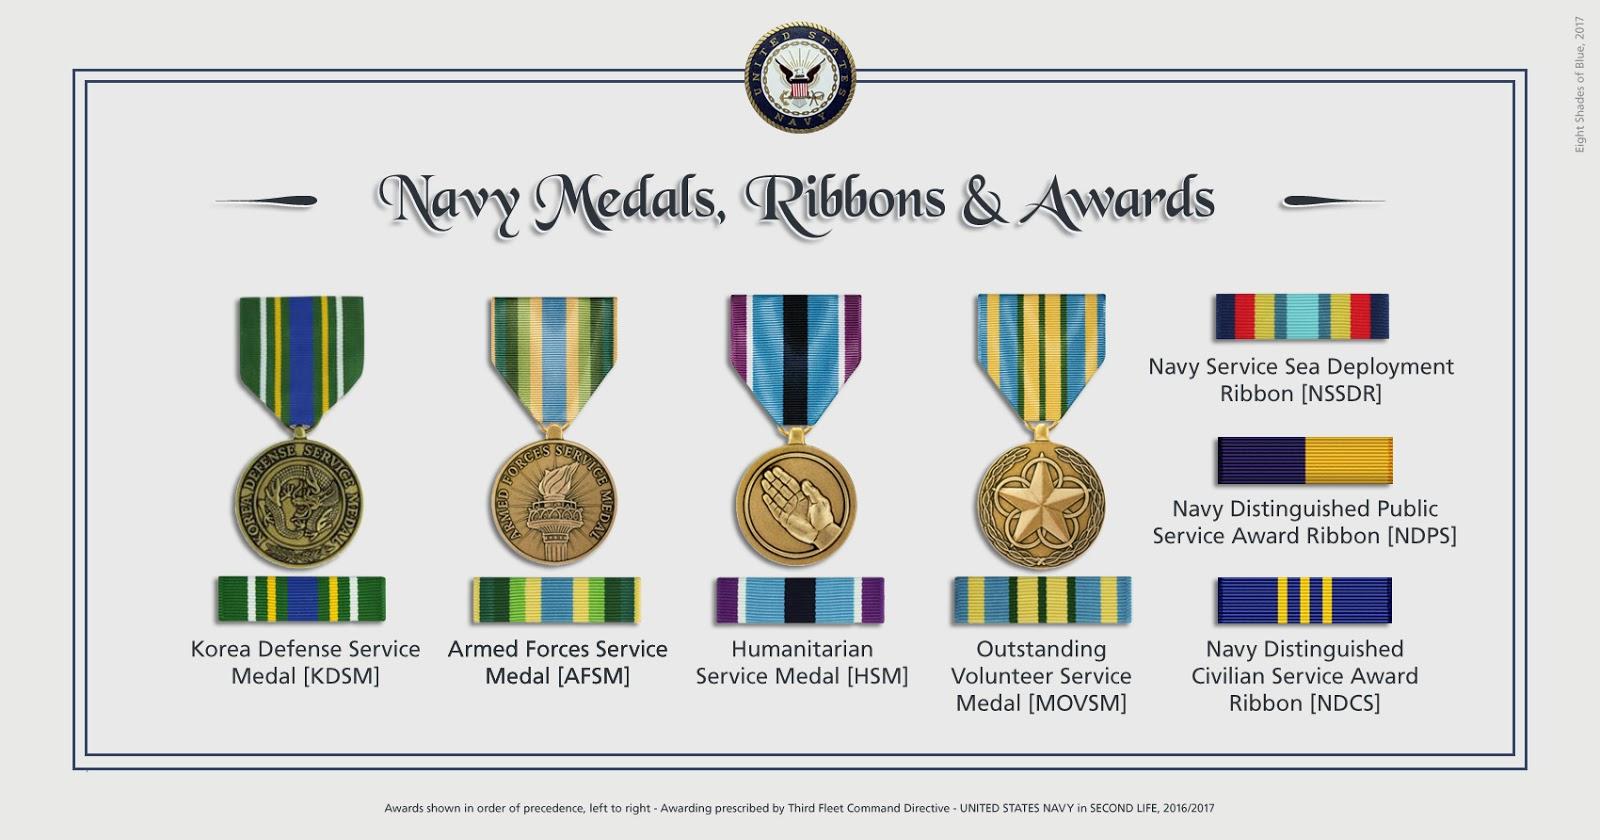 N A S  Miramar NFWS / SL: Medals and Awards of Third Fleet